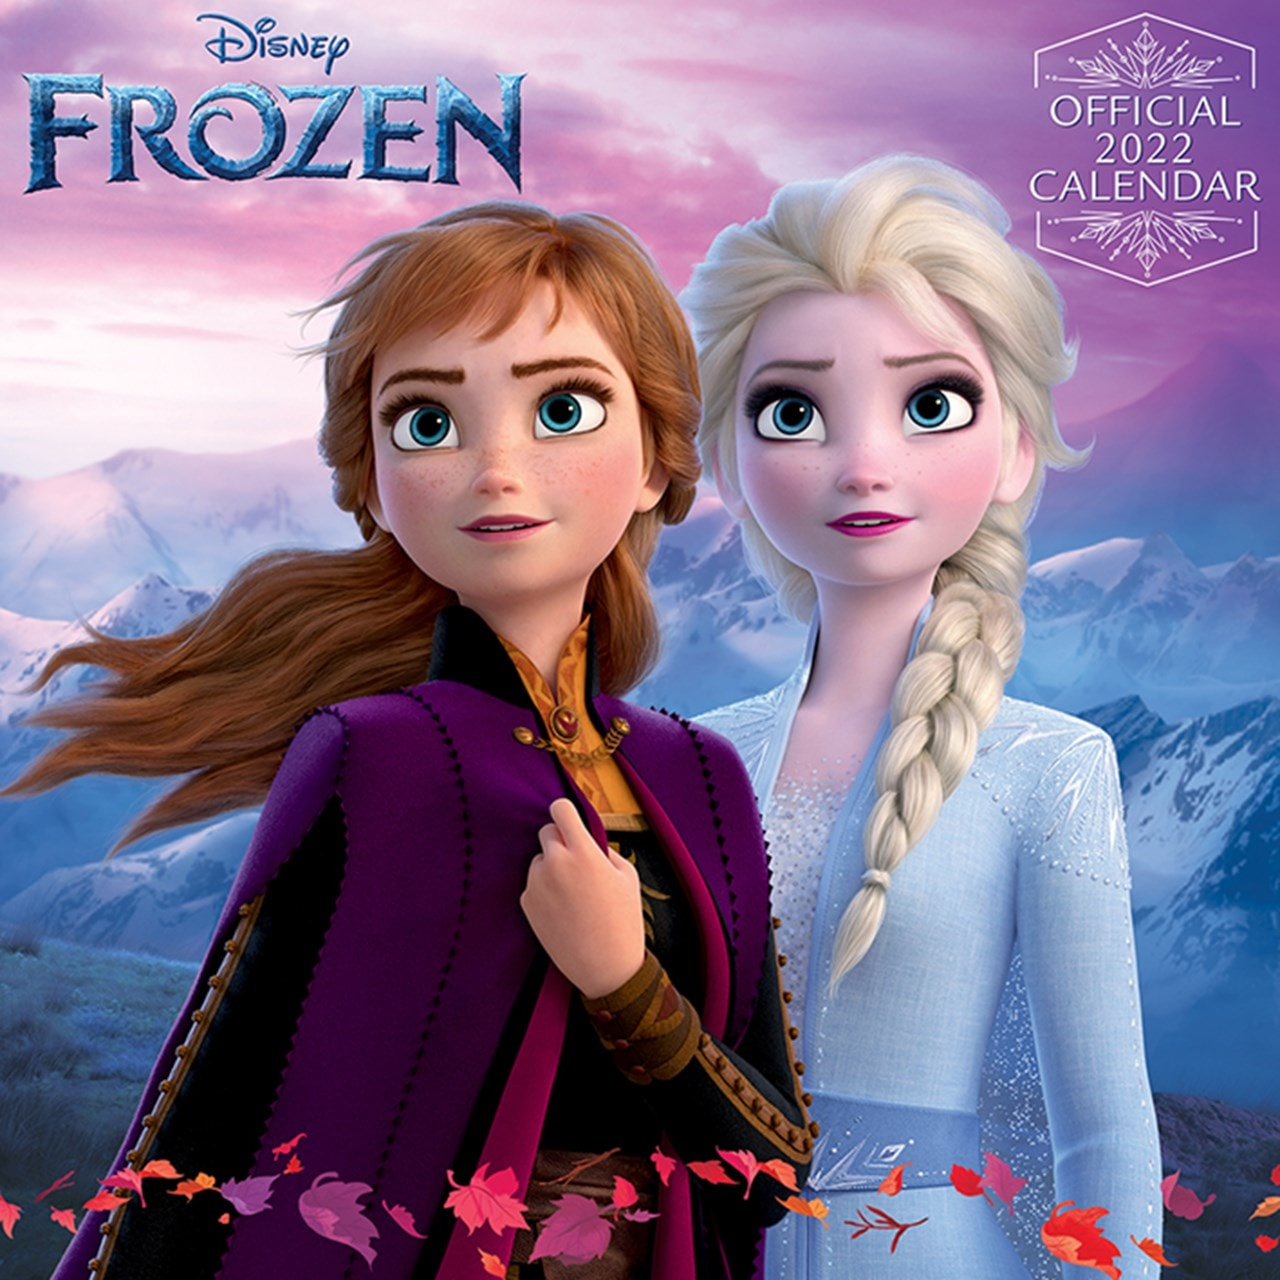 Frozen: Square 2022 Calendar - 1